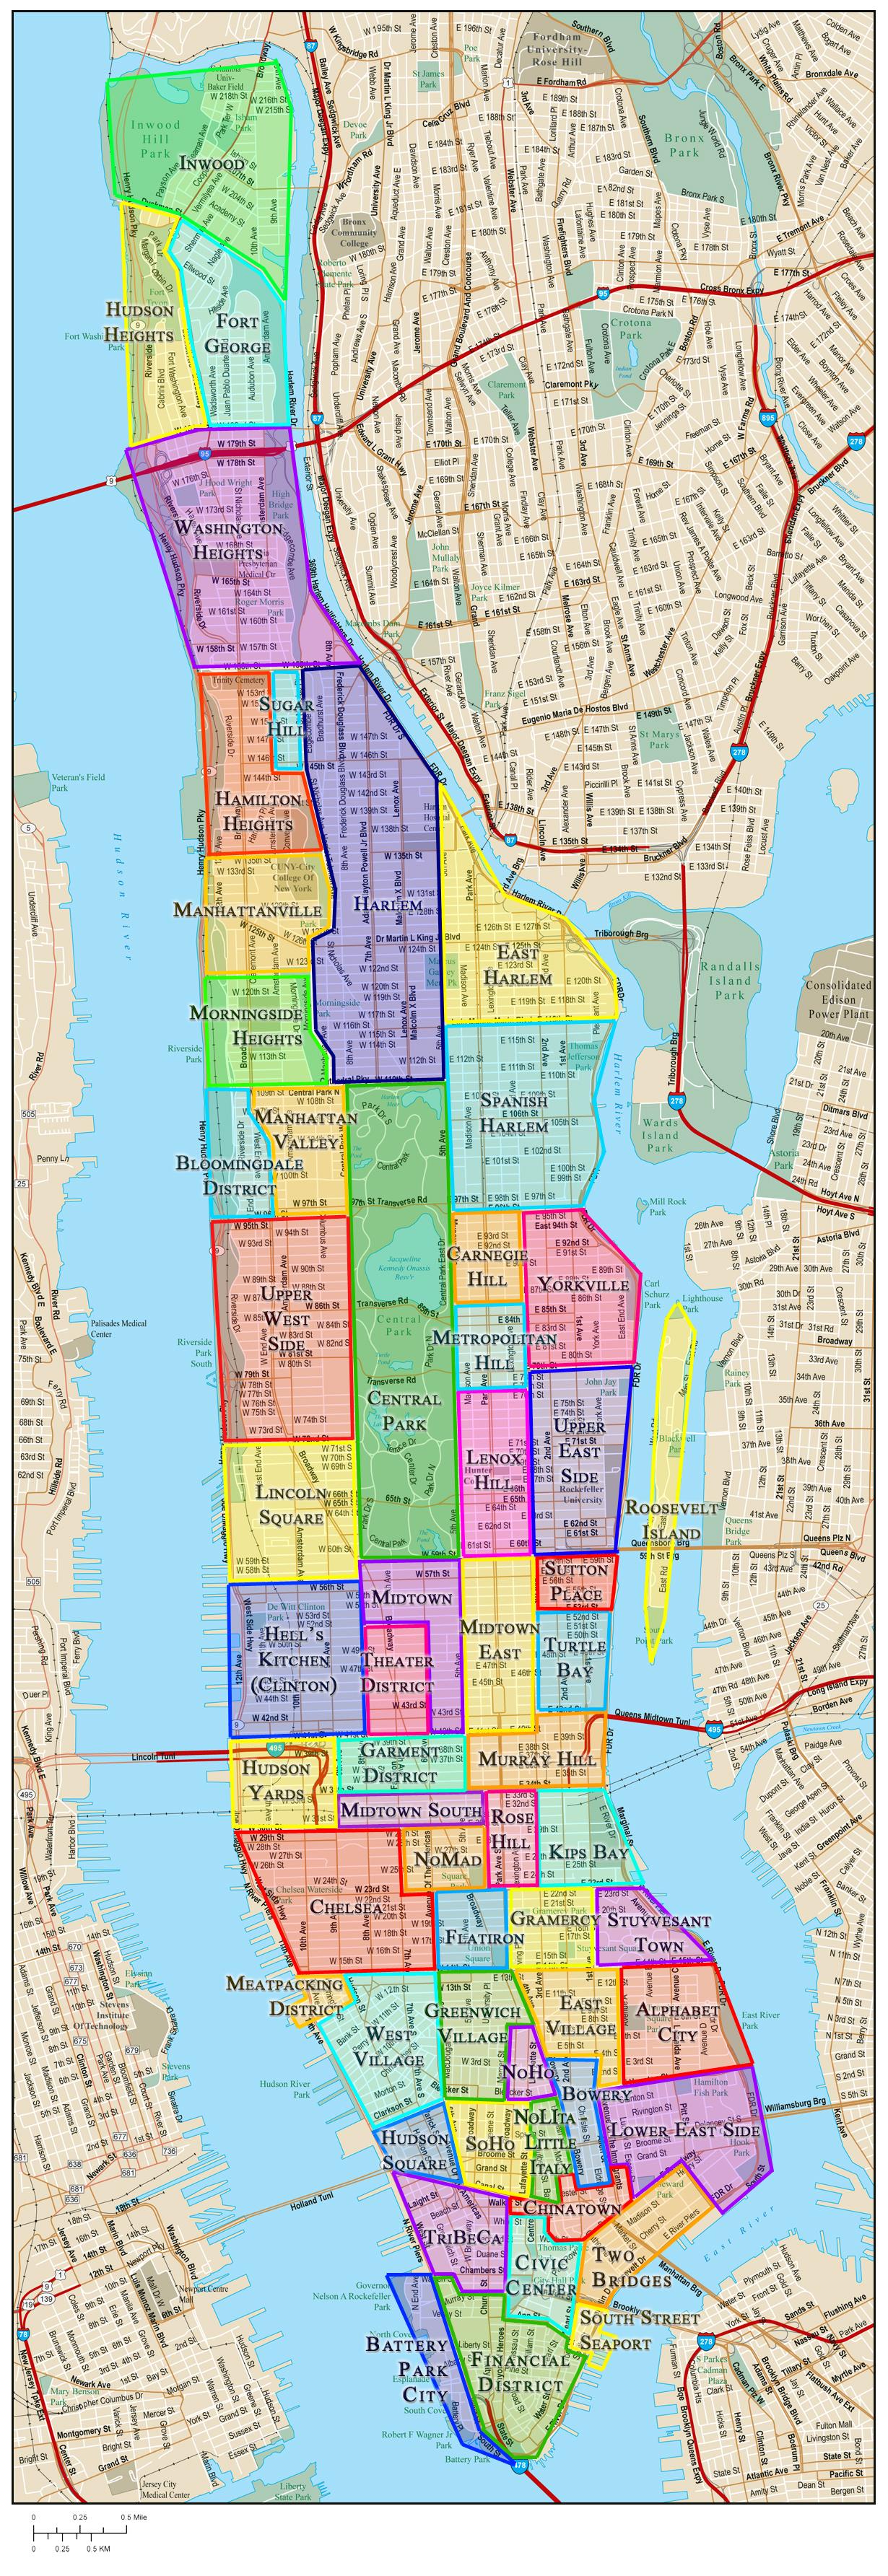 Manhattan_Neighborhoods-15-12